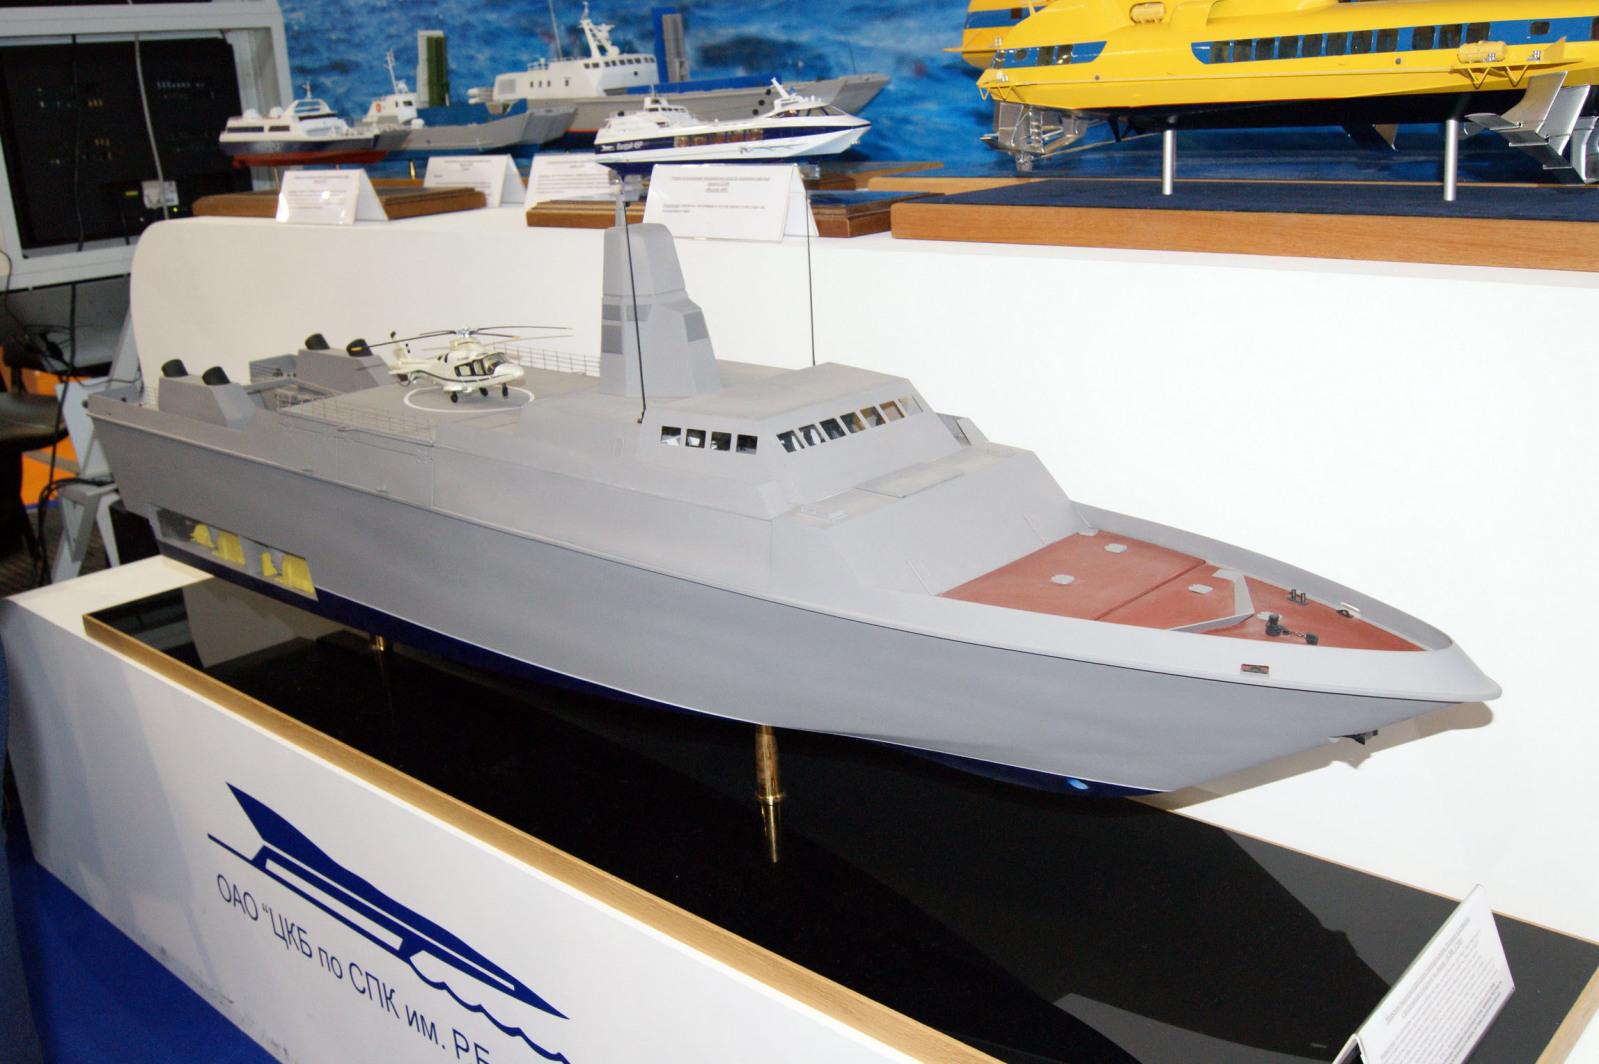 2015 Naval Show - St. Petersburg 14tc85z